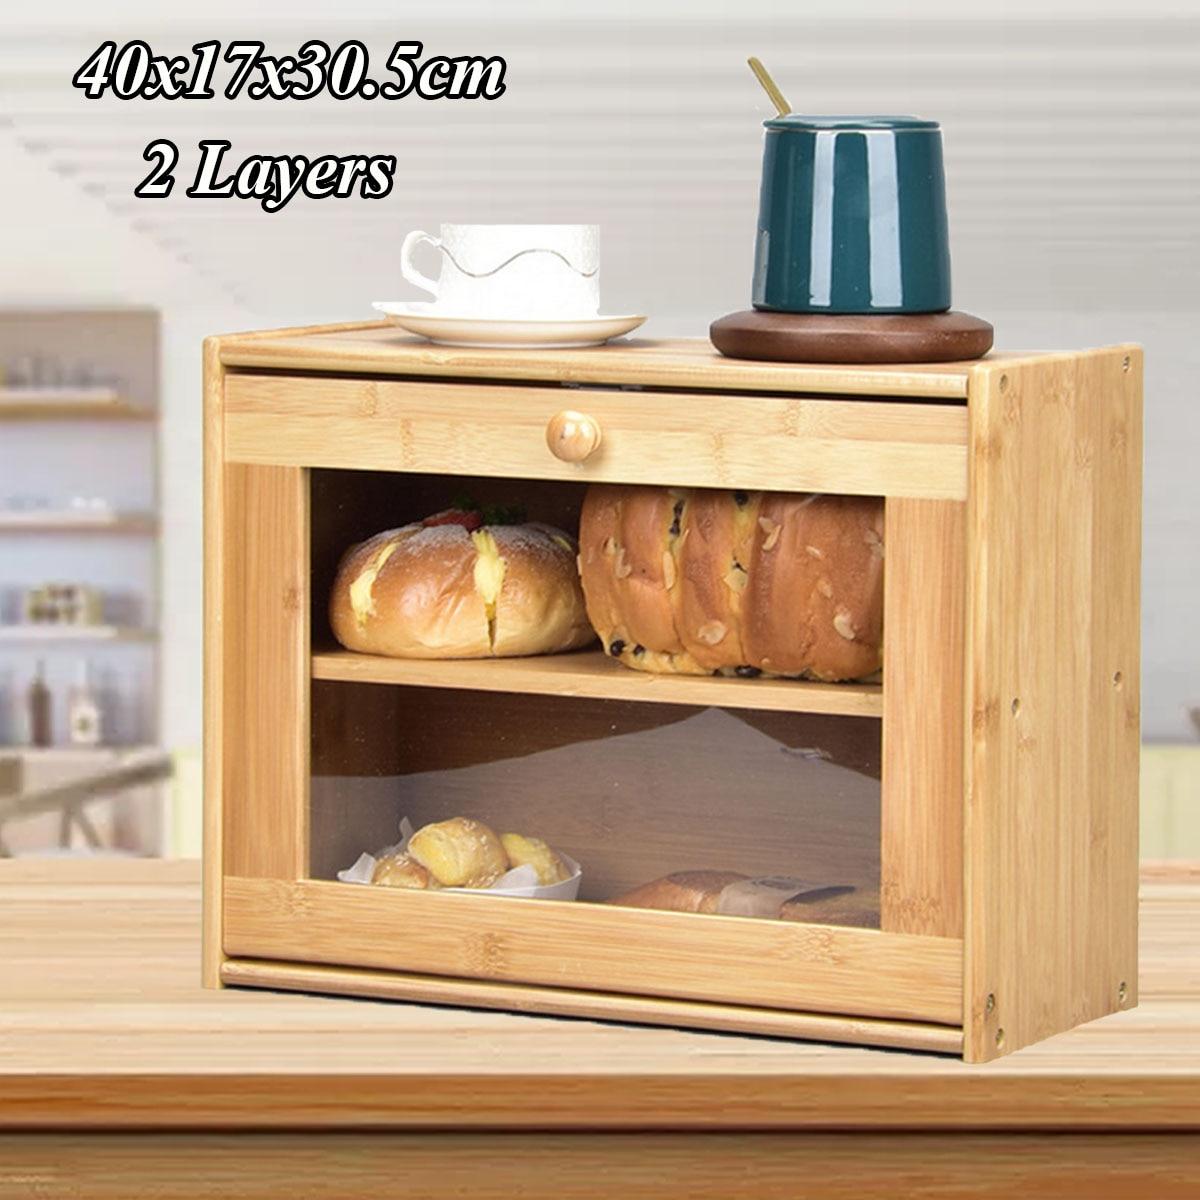 Caja de almacenamiento, caja de pan de bambú, contenedores de comida de doble capa, gaveta grande, organizador de cocina, accesorios para el hogar